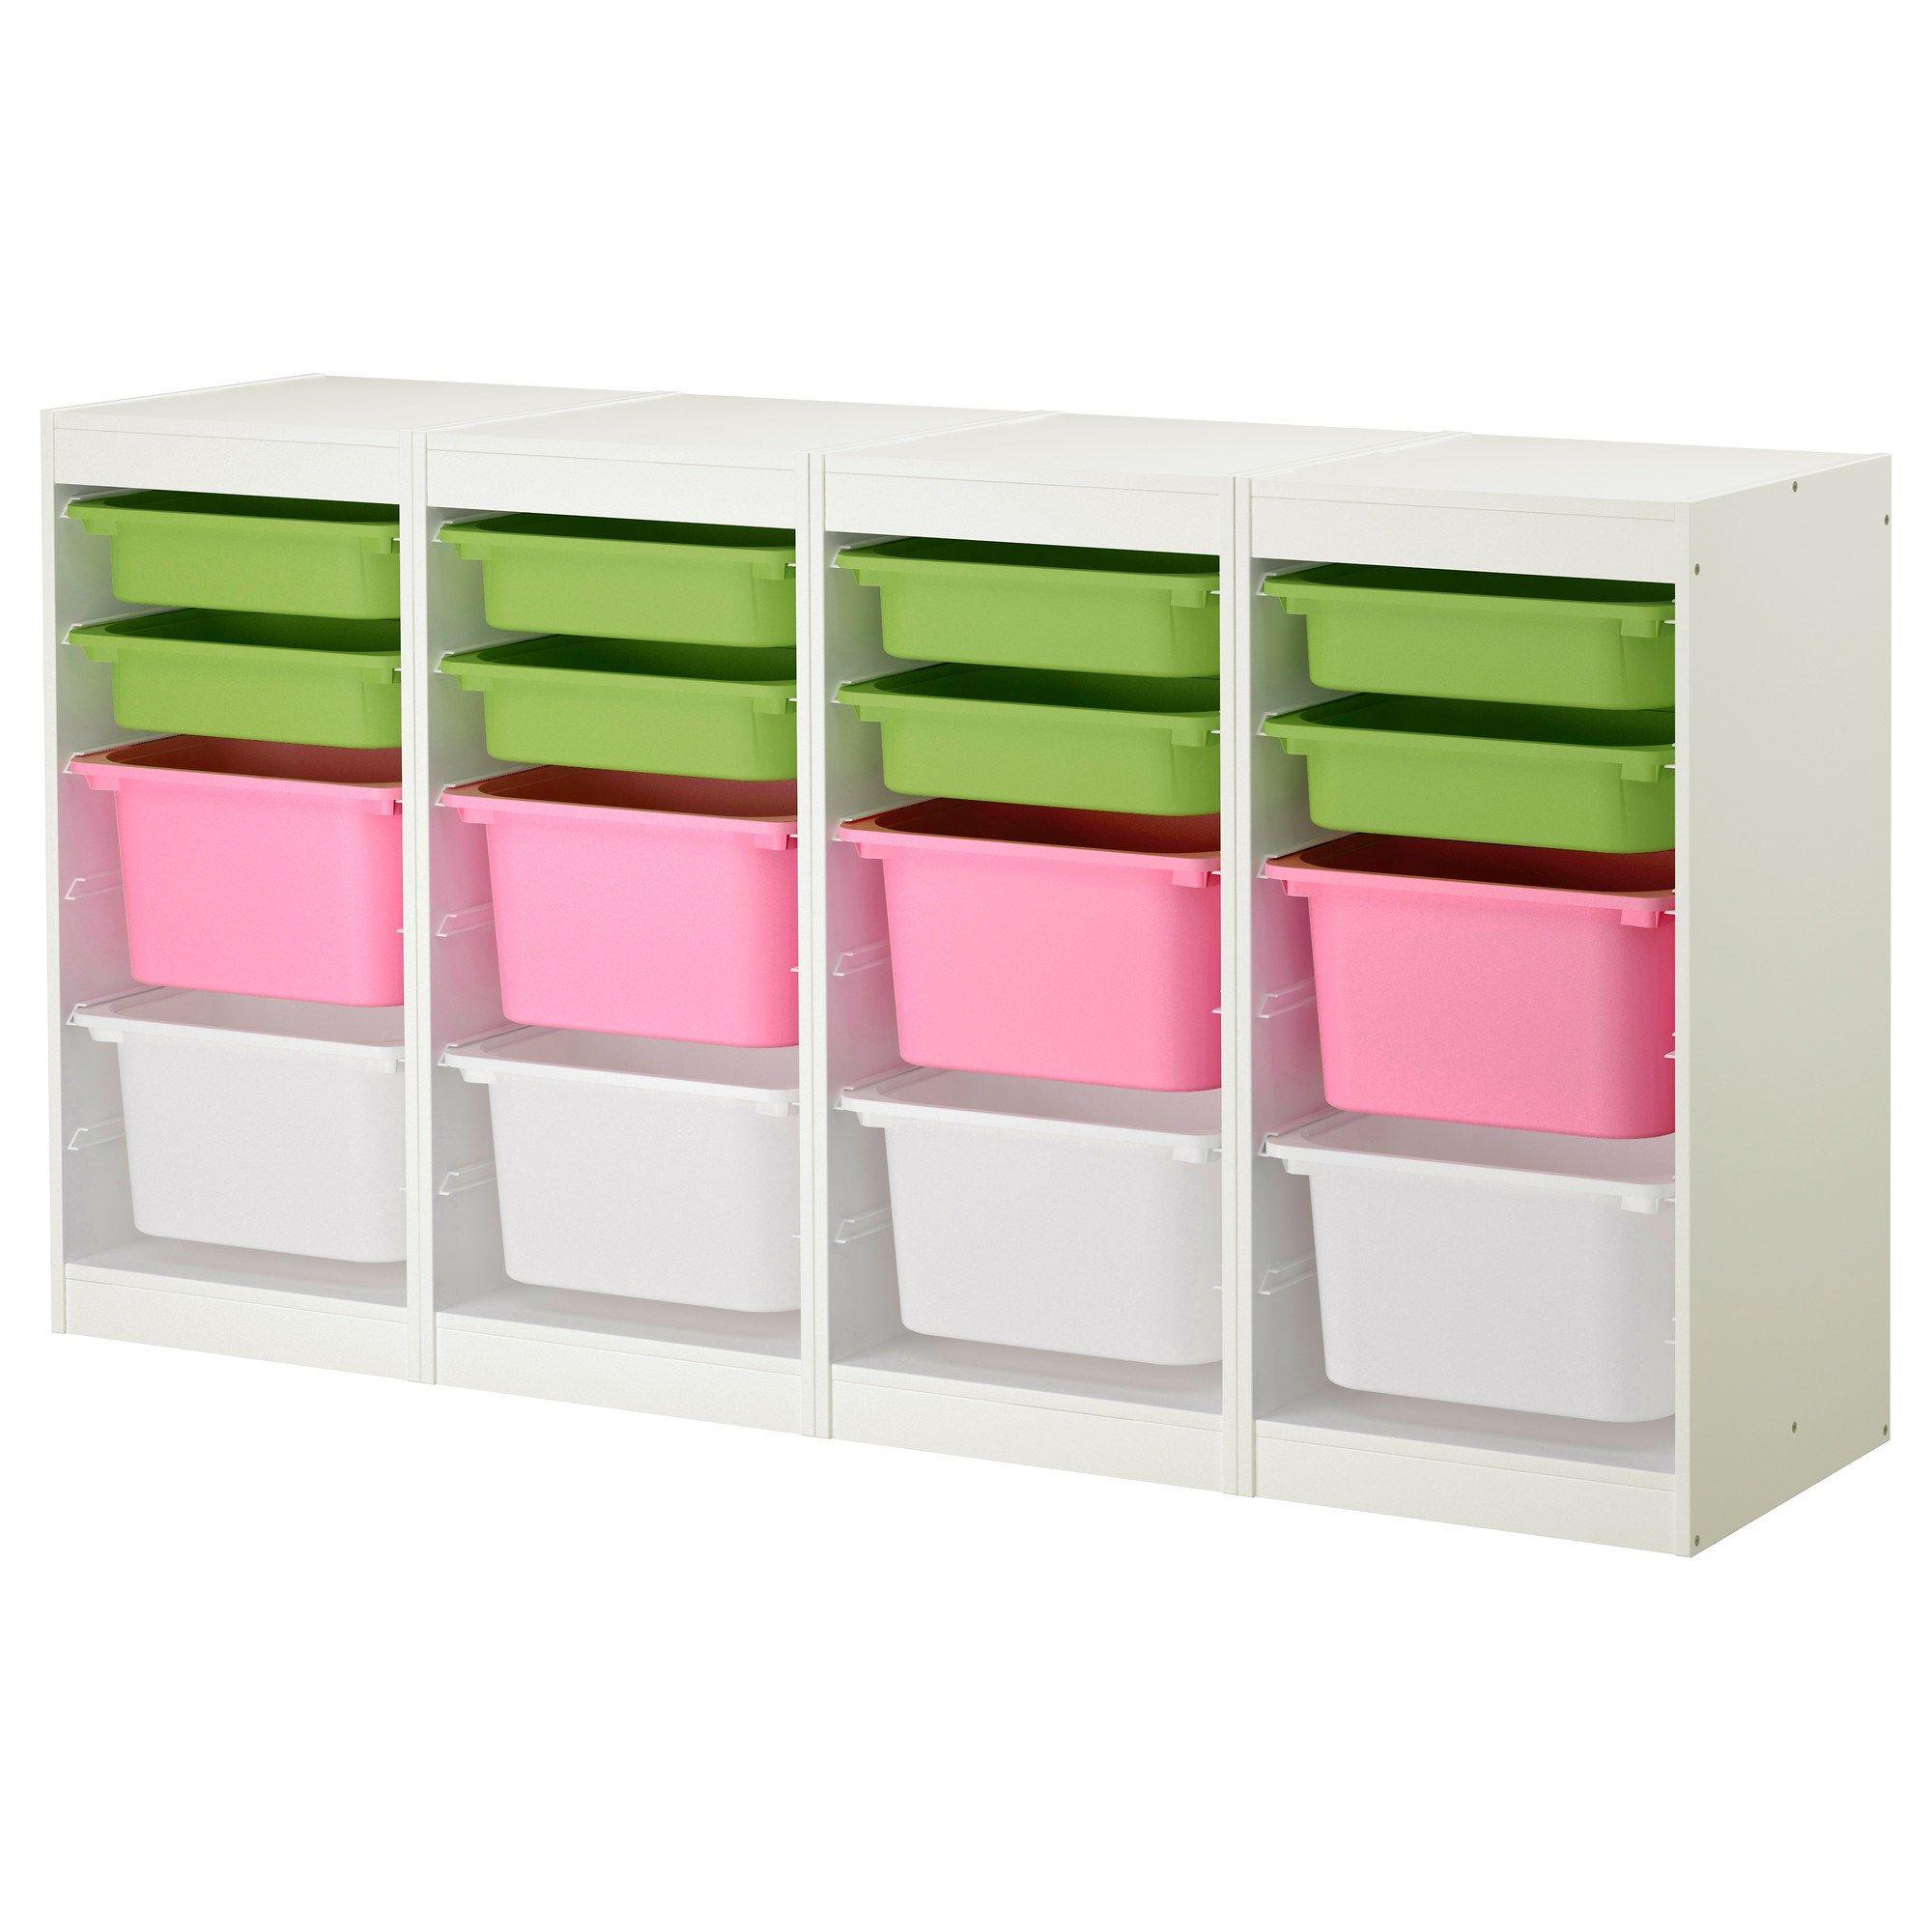 Playroom storage systems - Explore Playroom Storage Playroom Ideas And More